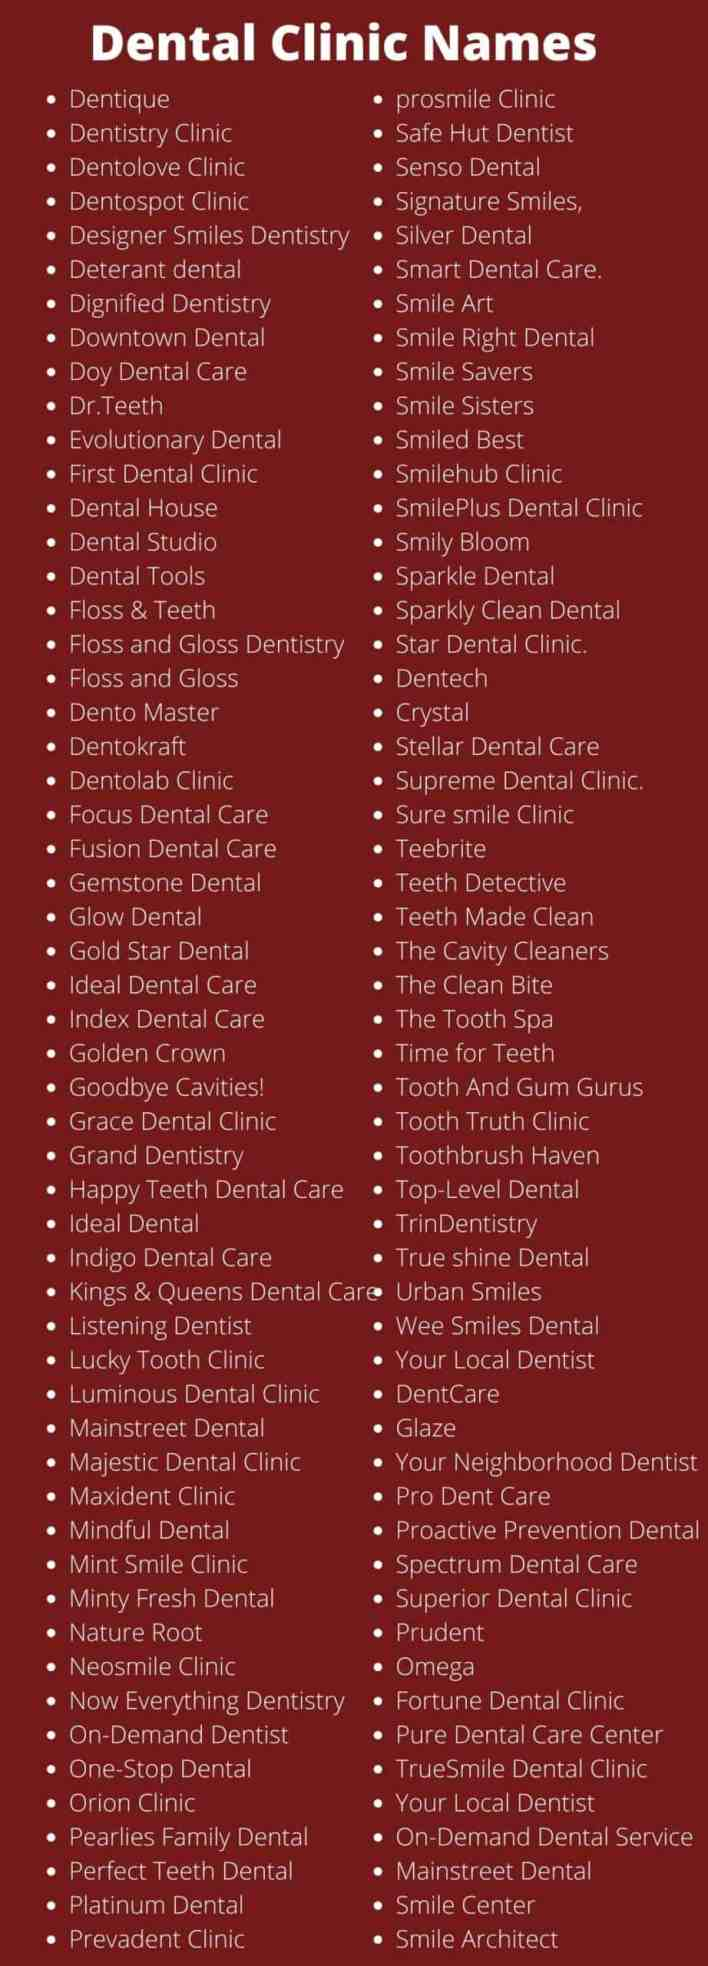 Dental Clinic Names